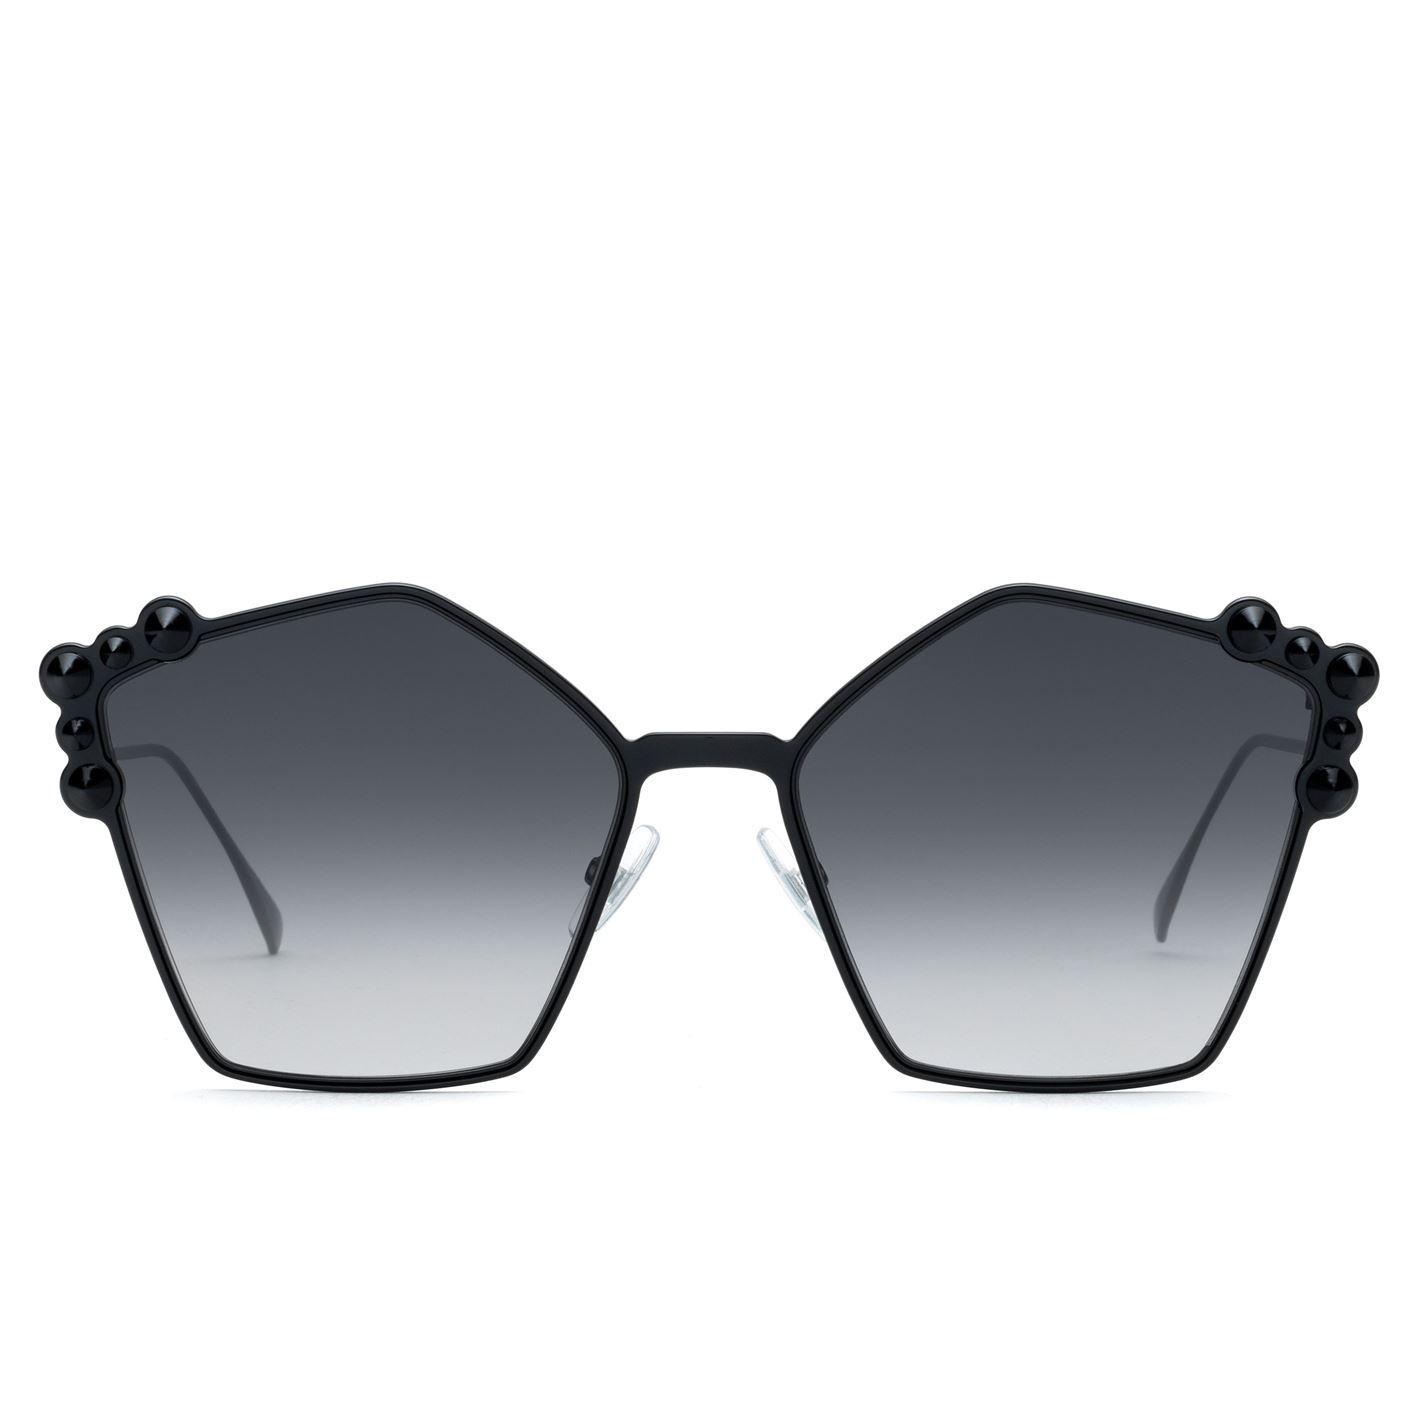 ec2f1d955d53 Fendi 0261 Sunglasses in Black - Lyst